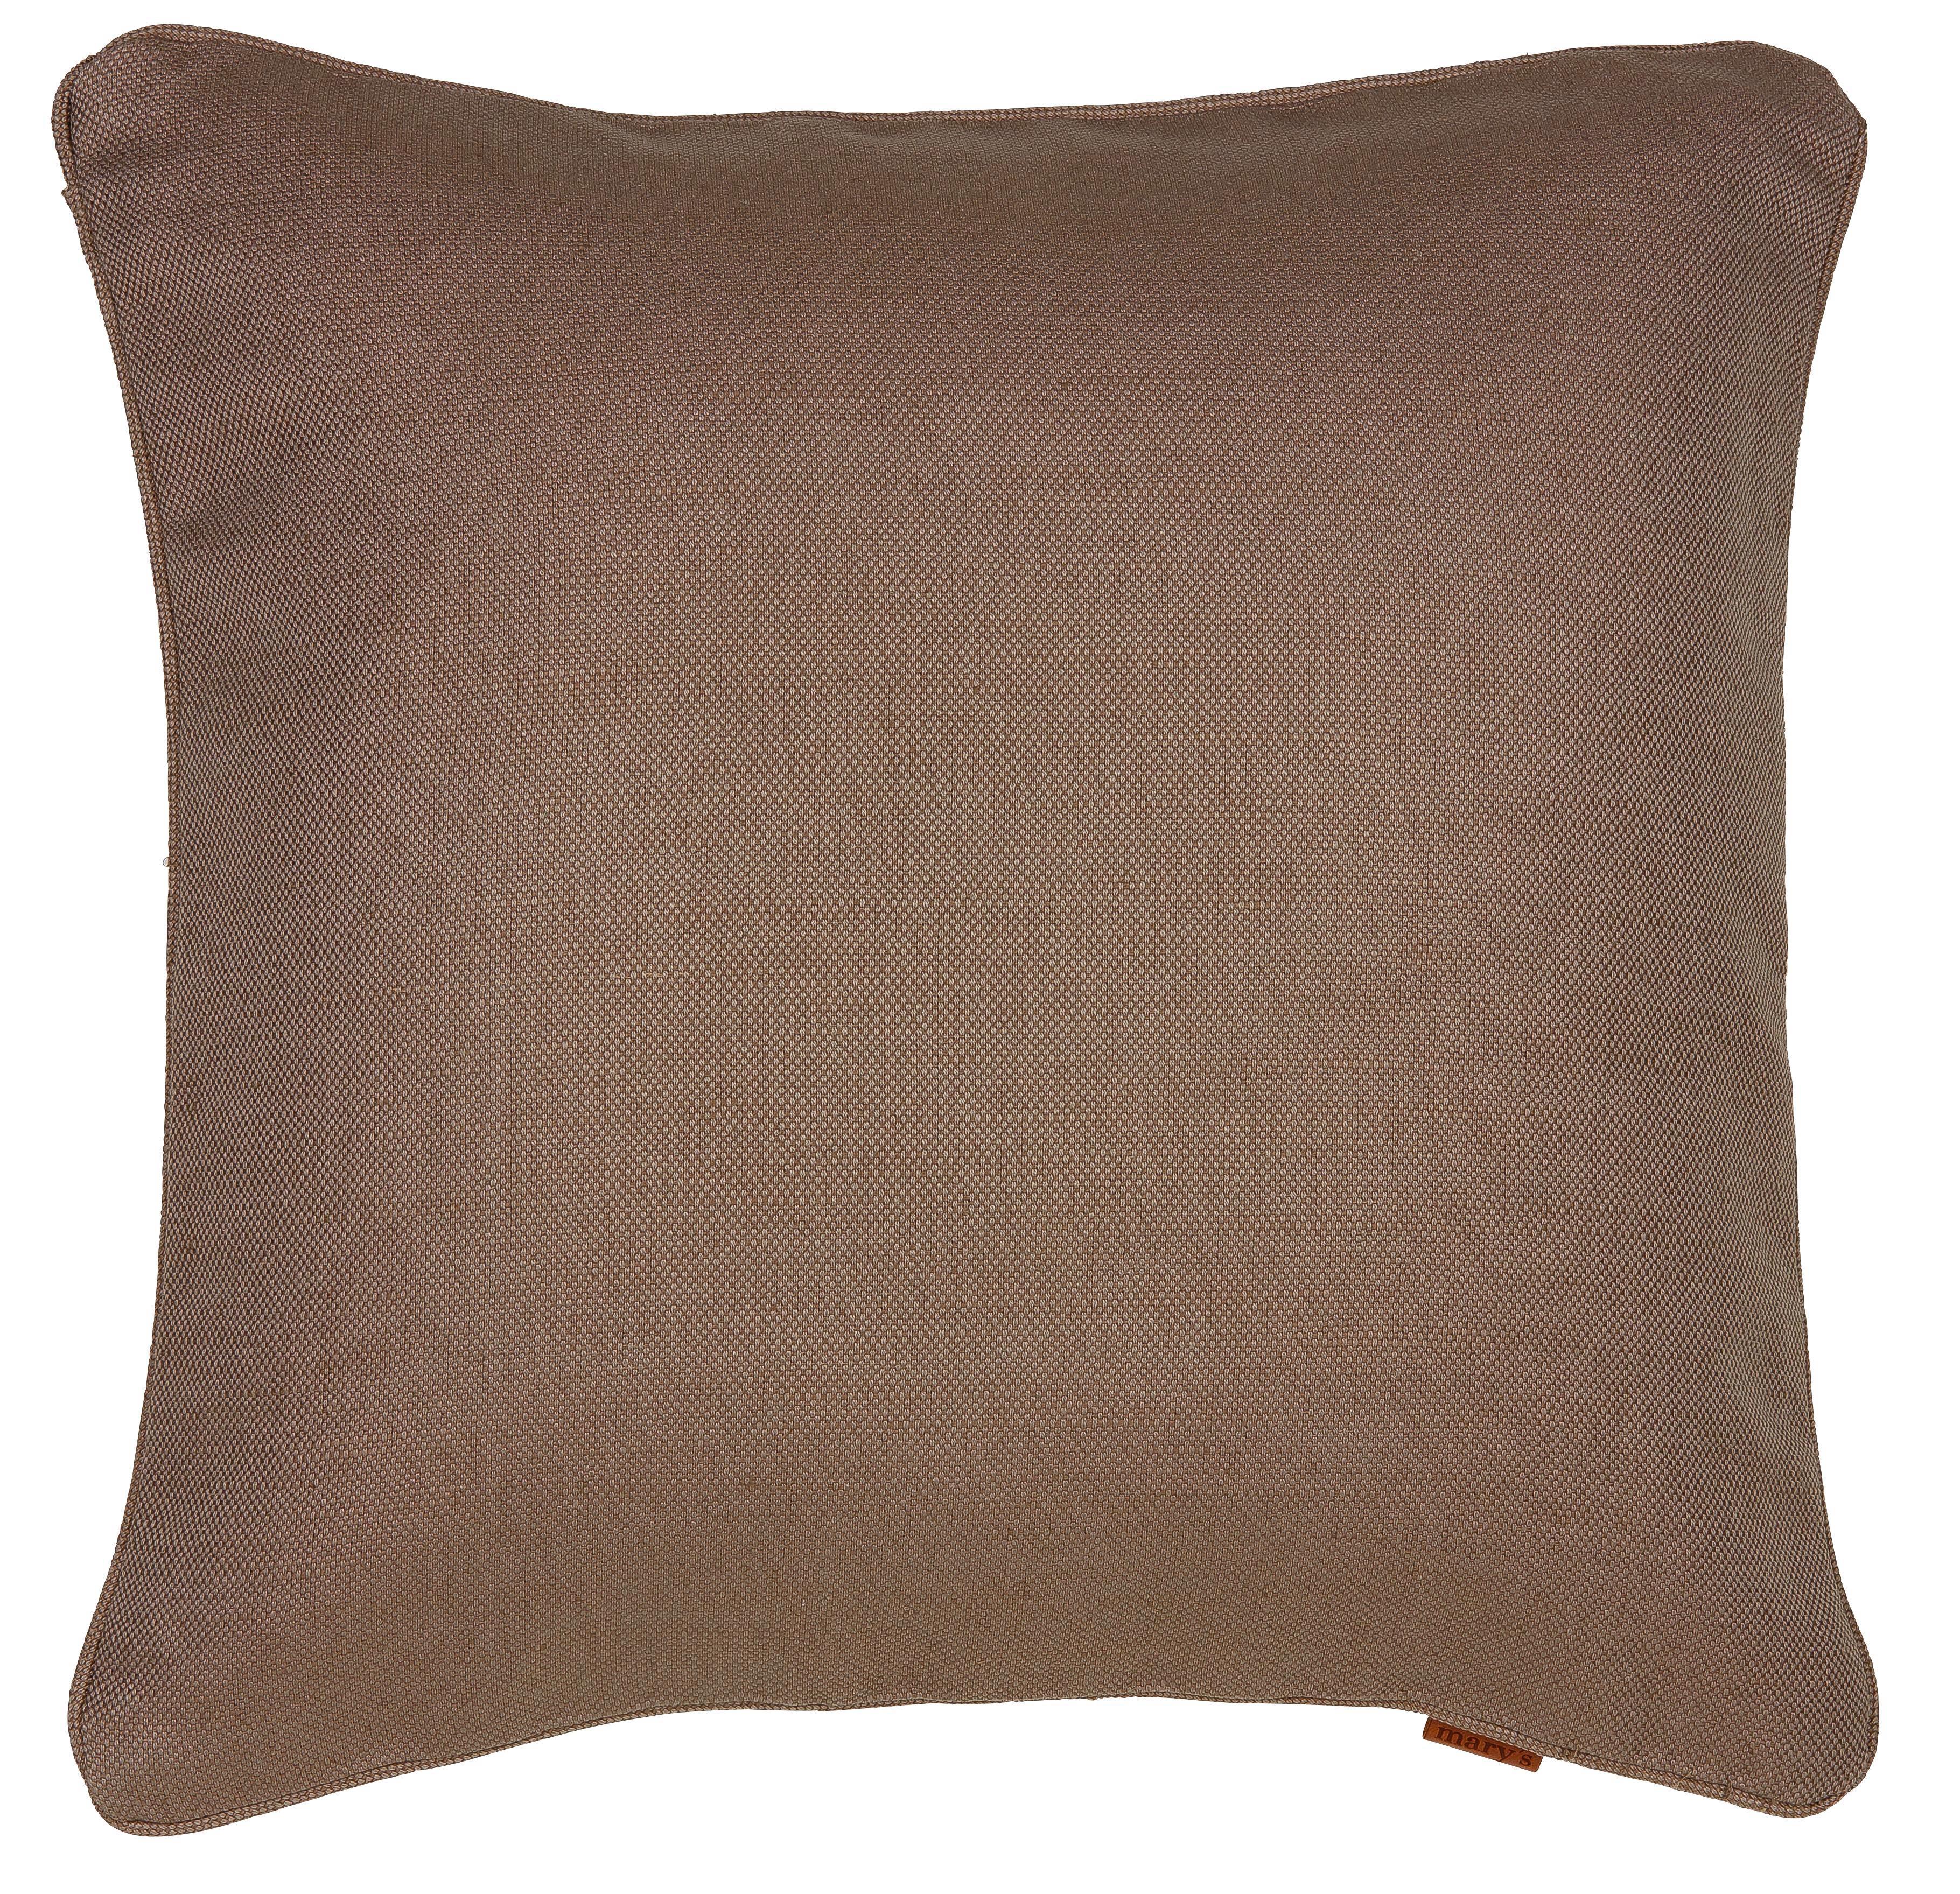 Párnahuzat Jenni Jute - szürkésbarna, modern, textil (48/48cm) - MÖMAX modern living